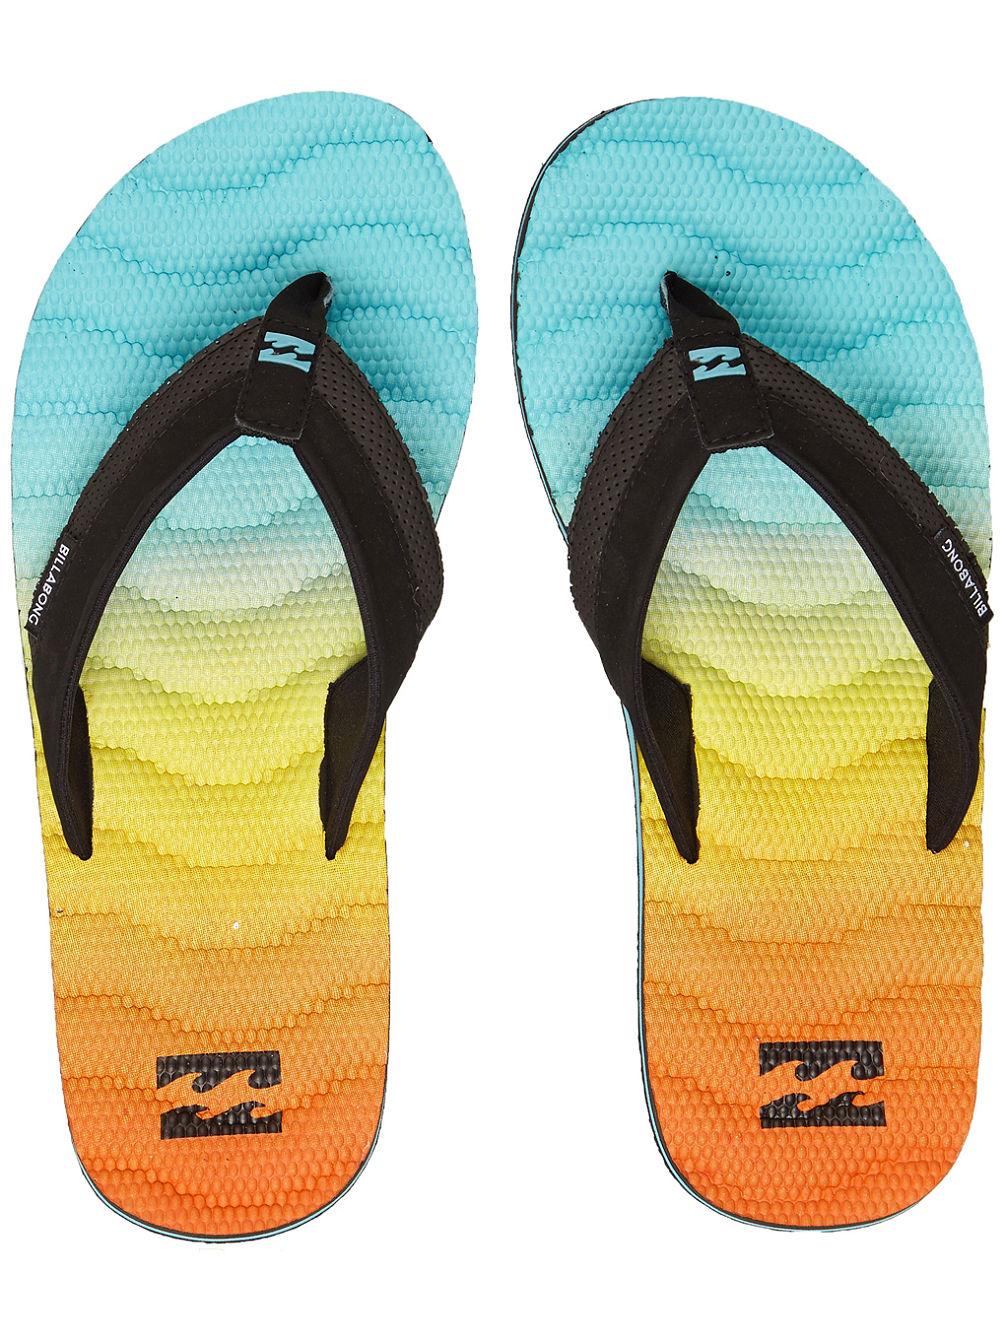 bce374b71afcb Dunes Impact Fade Sandals